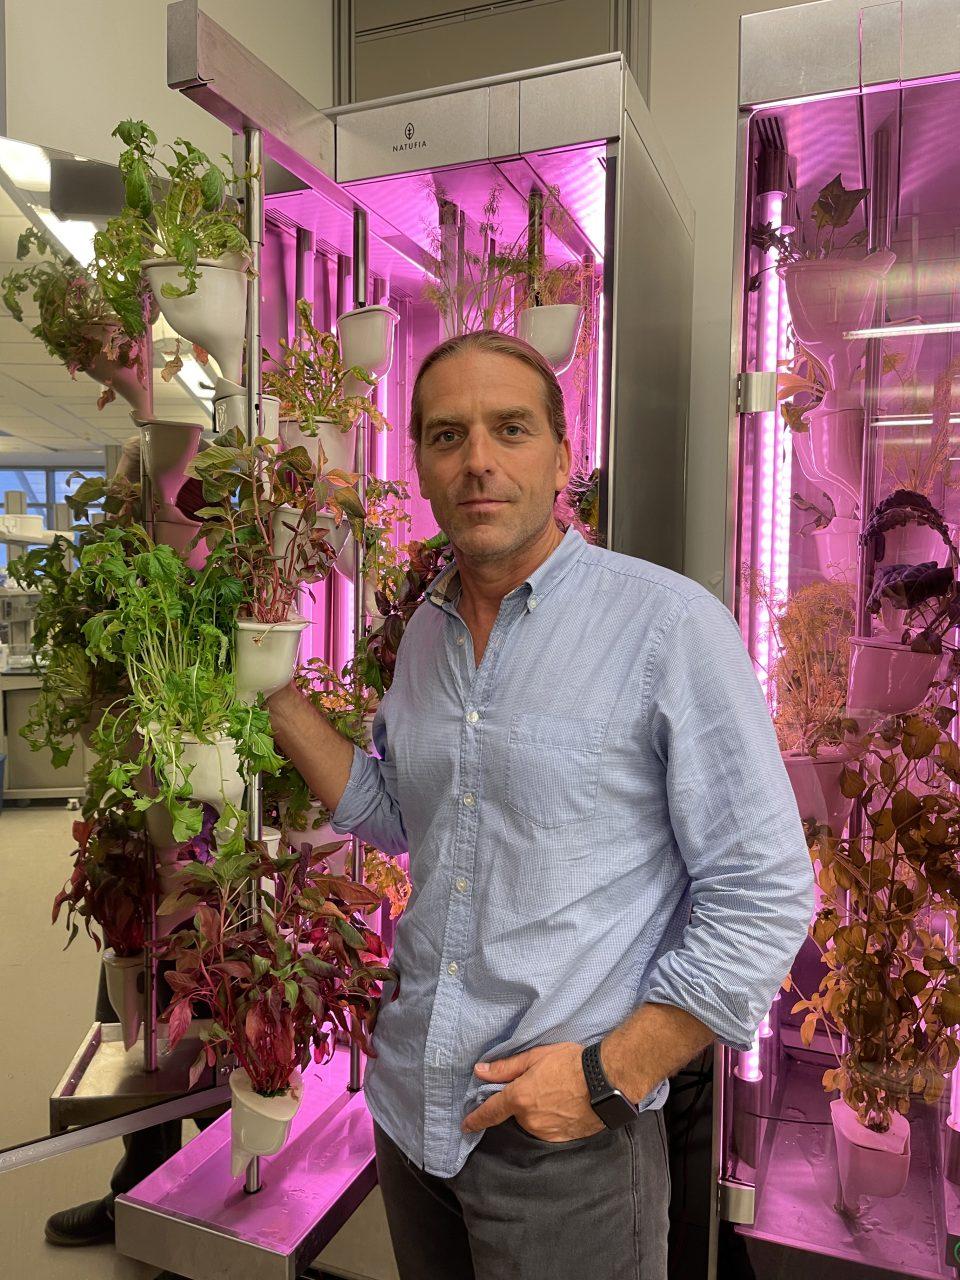 Gregory Lu CEO of Natufia next to the unit with abundant plants